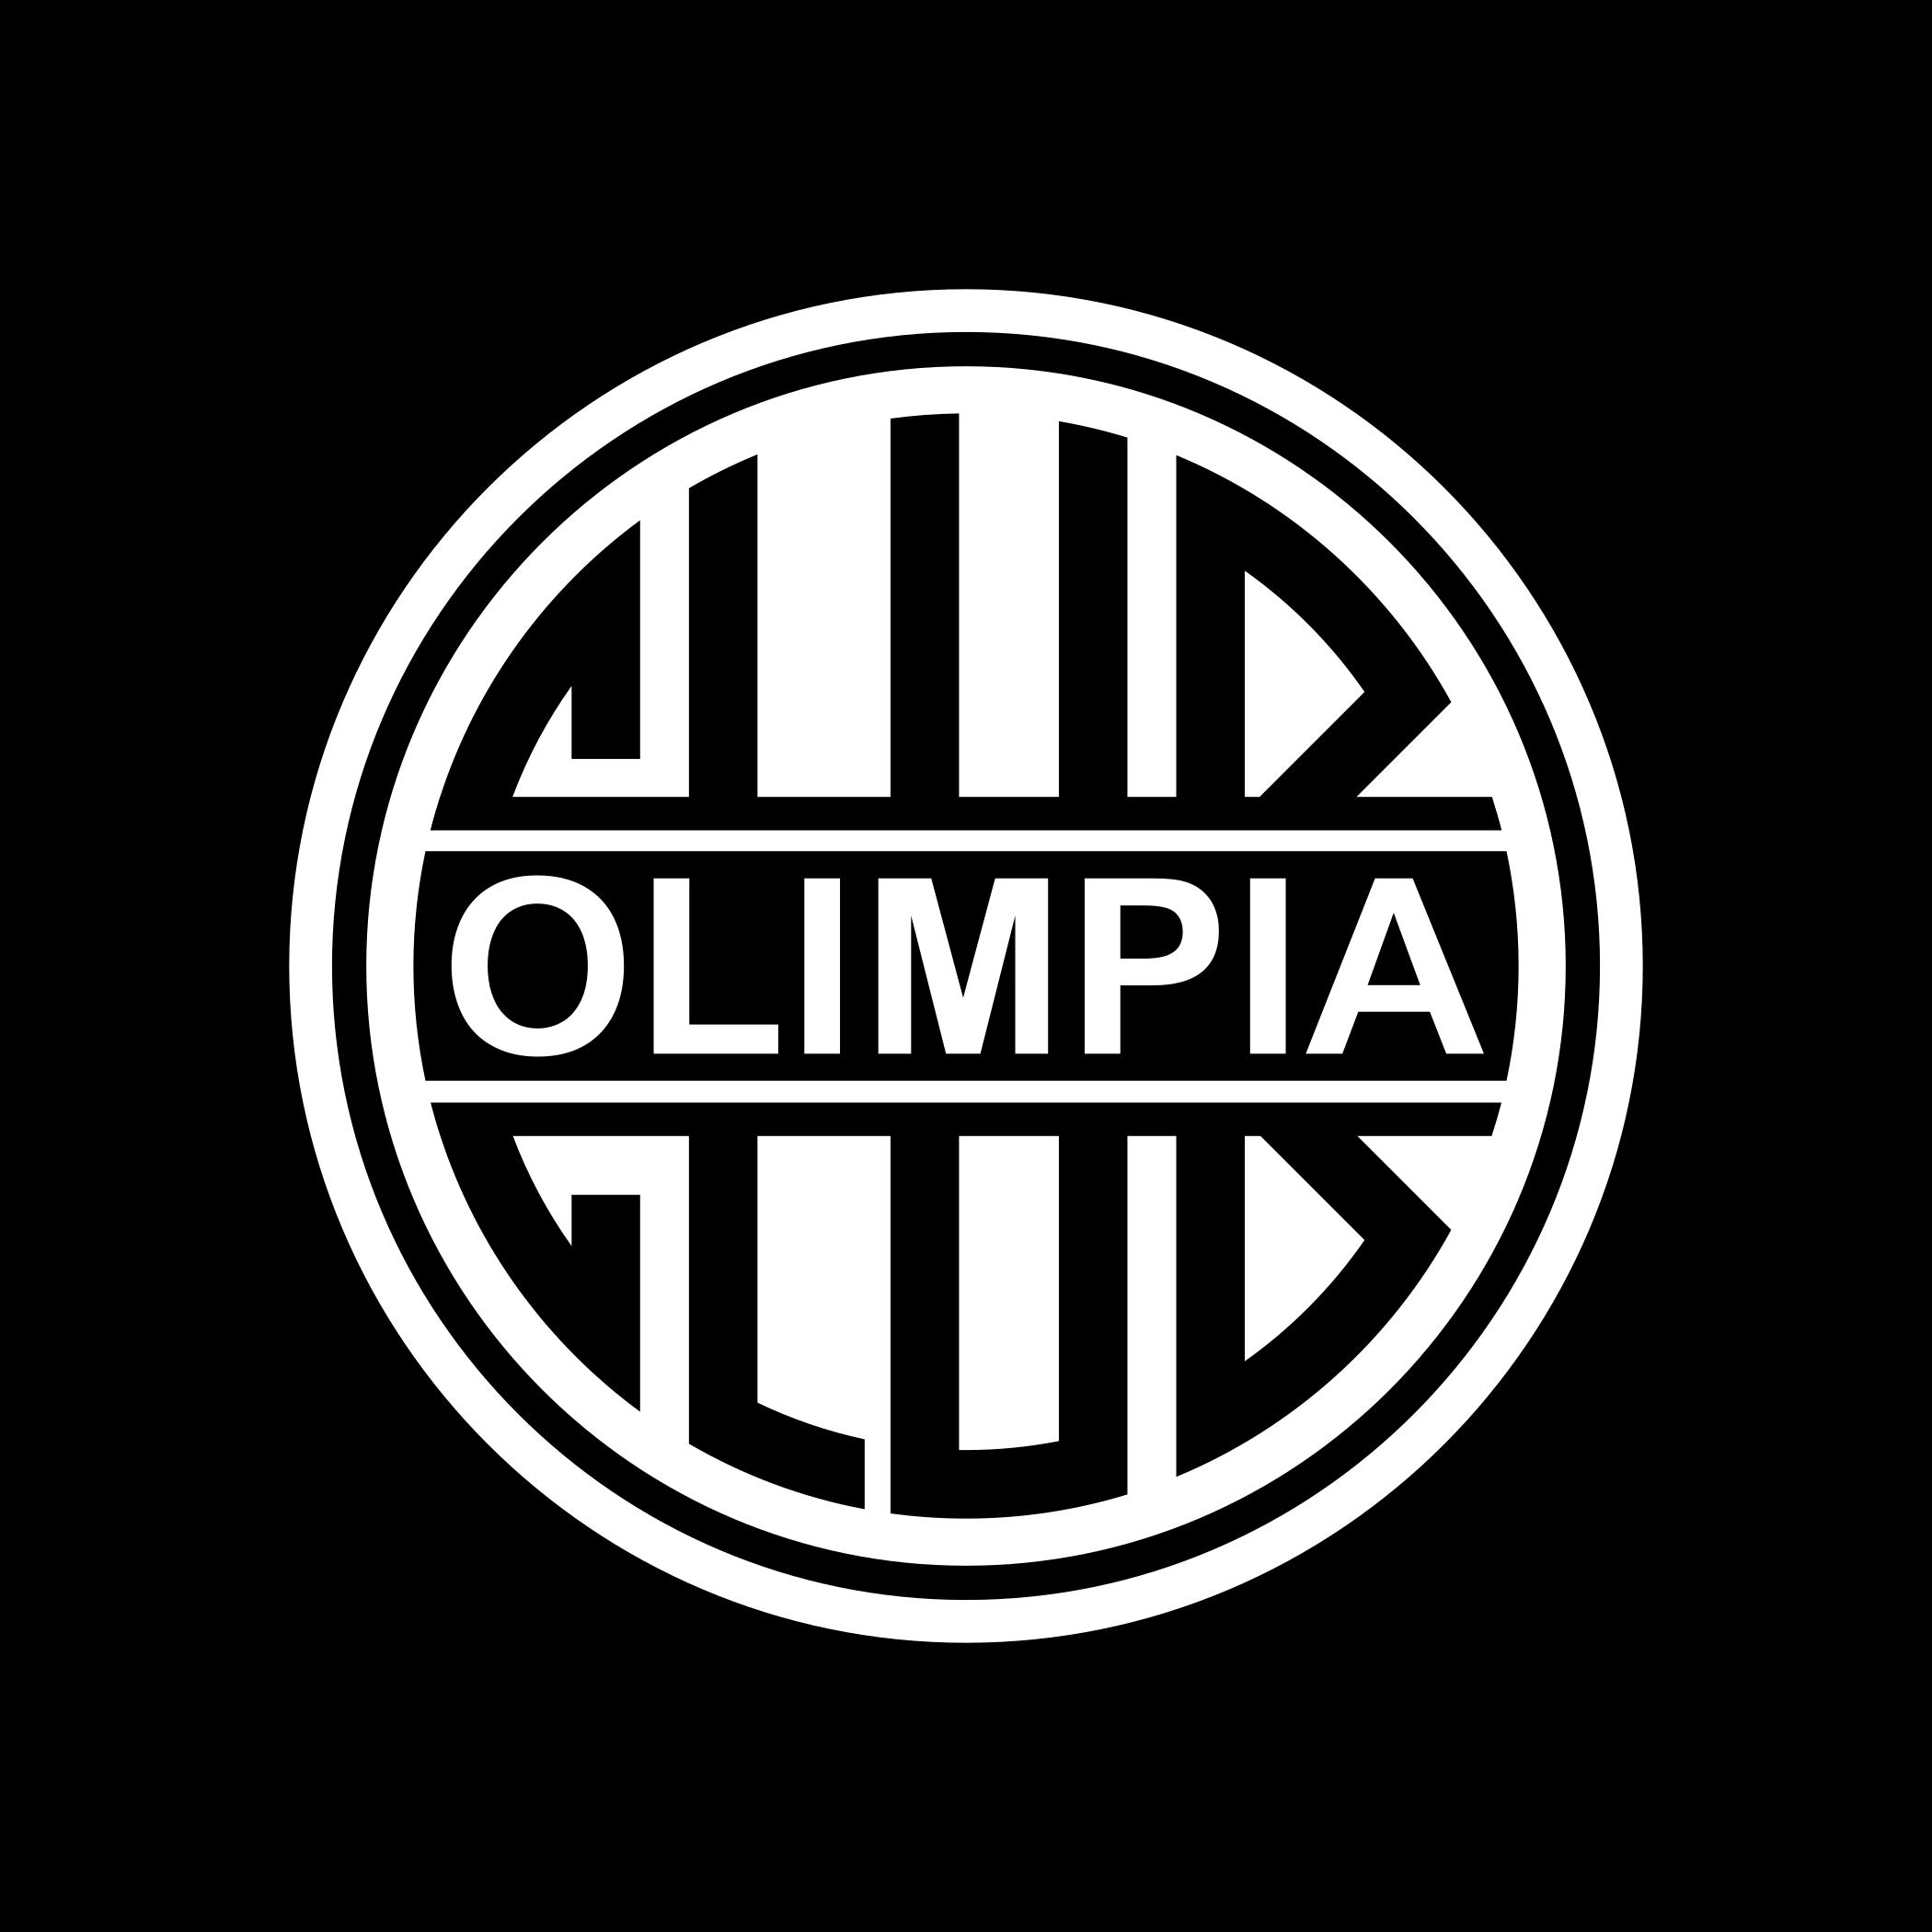 olimpia logo escudo 1 - Olimpia Logo - Club Olimpia Escudo